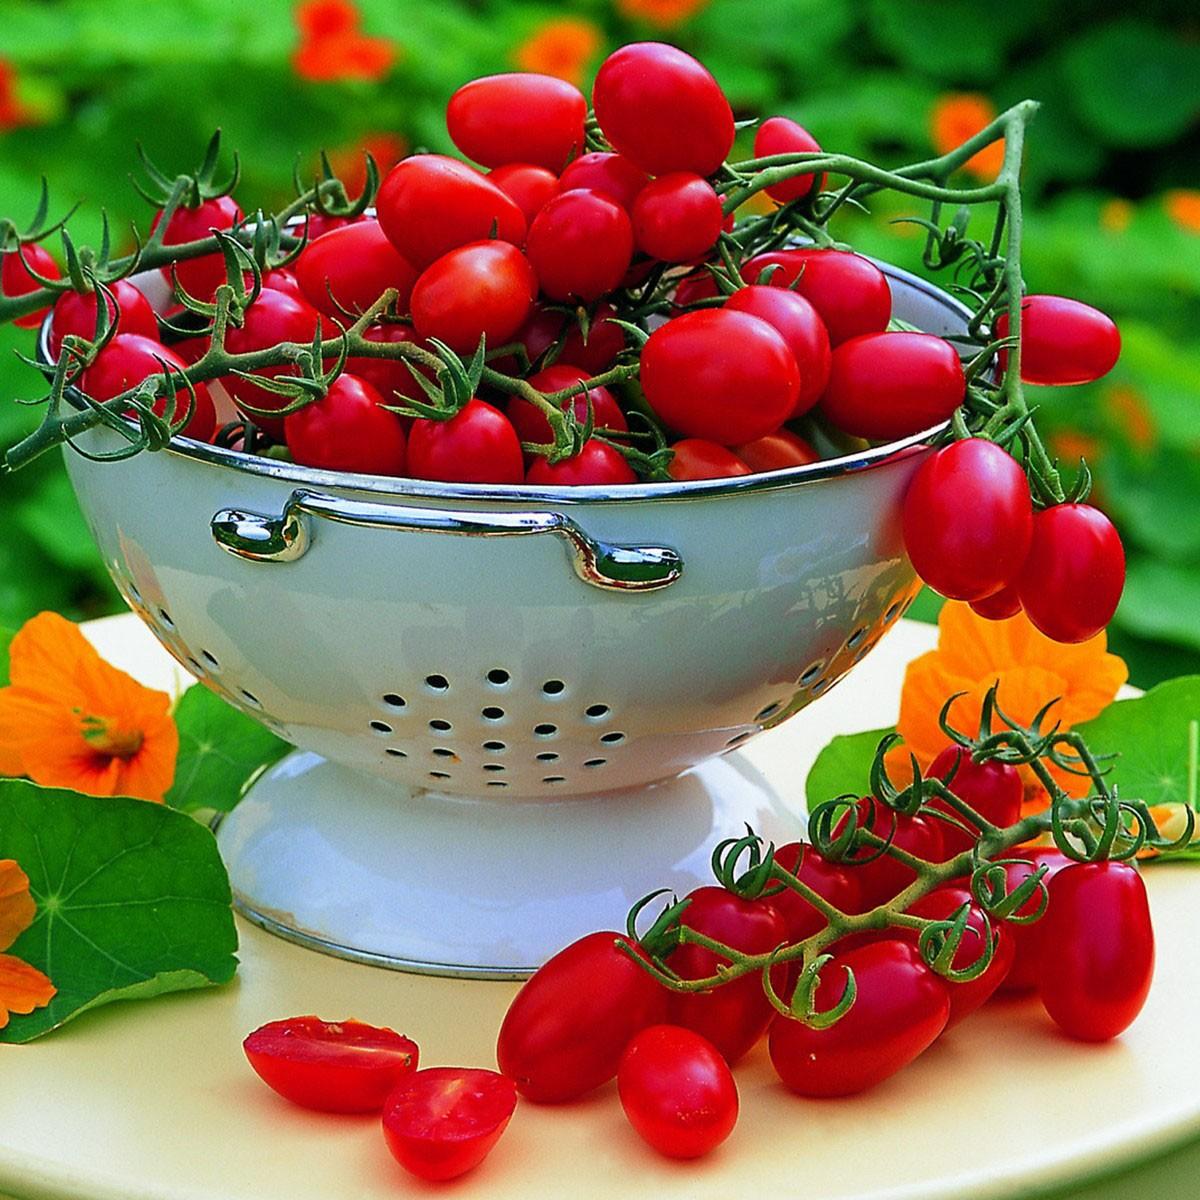 Pflaumen-Cherrytomate (veredelt) 'Mirado Red'